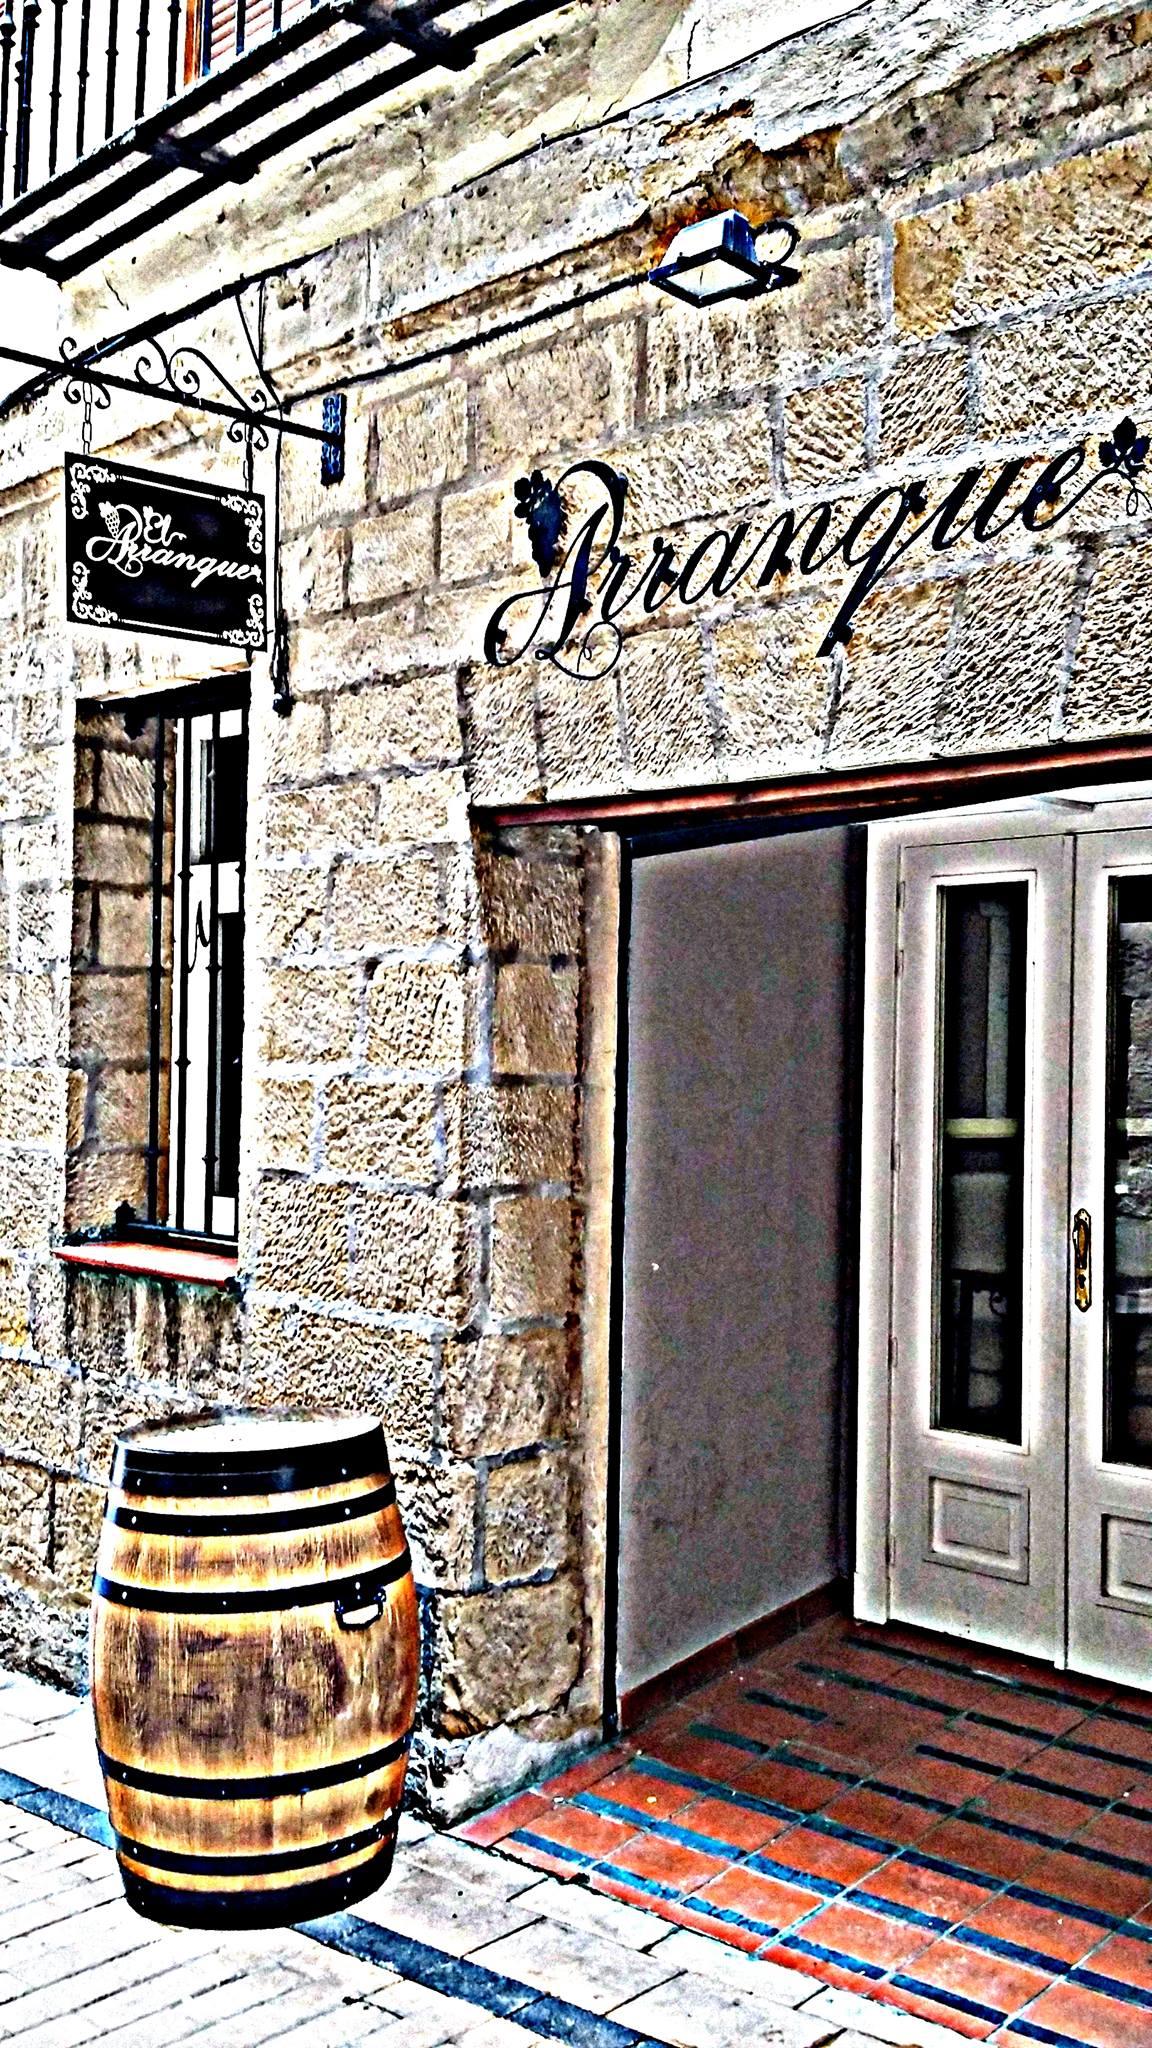 Bar El Arranque